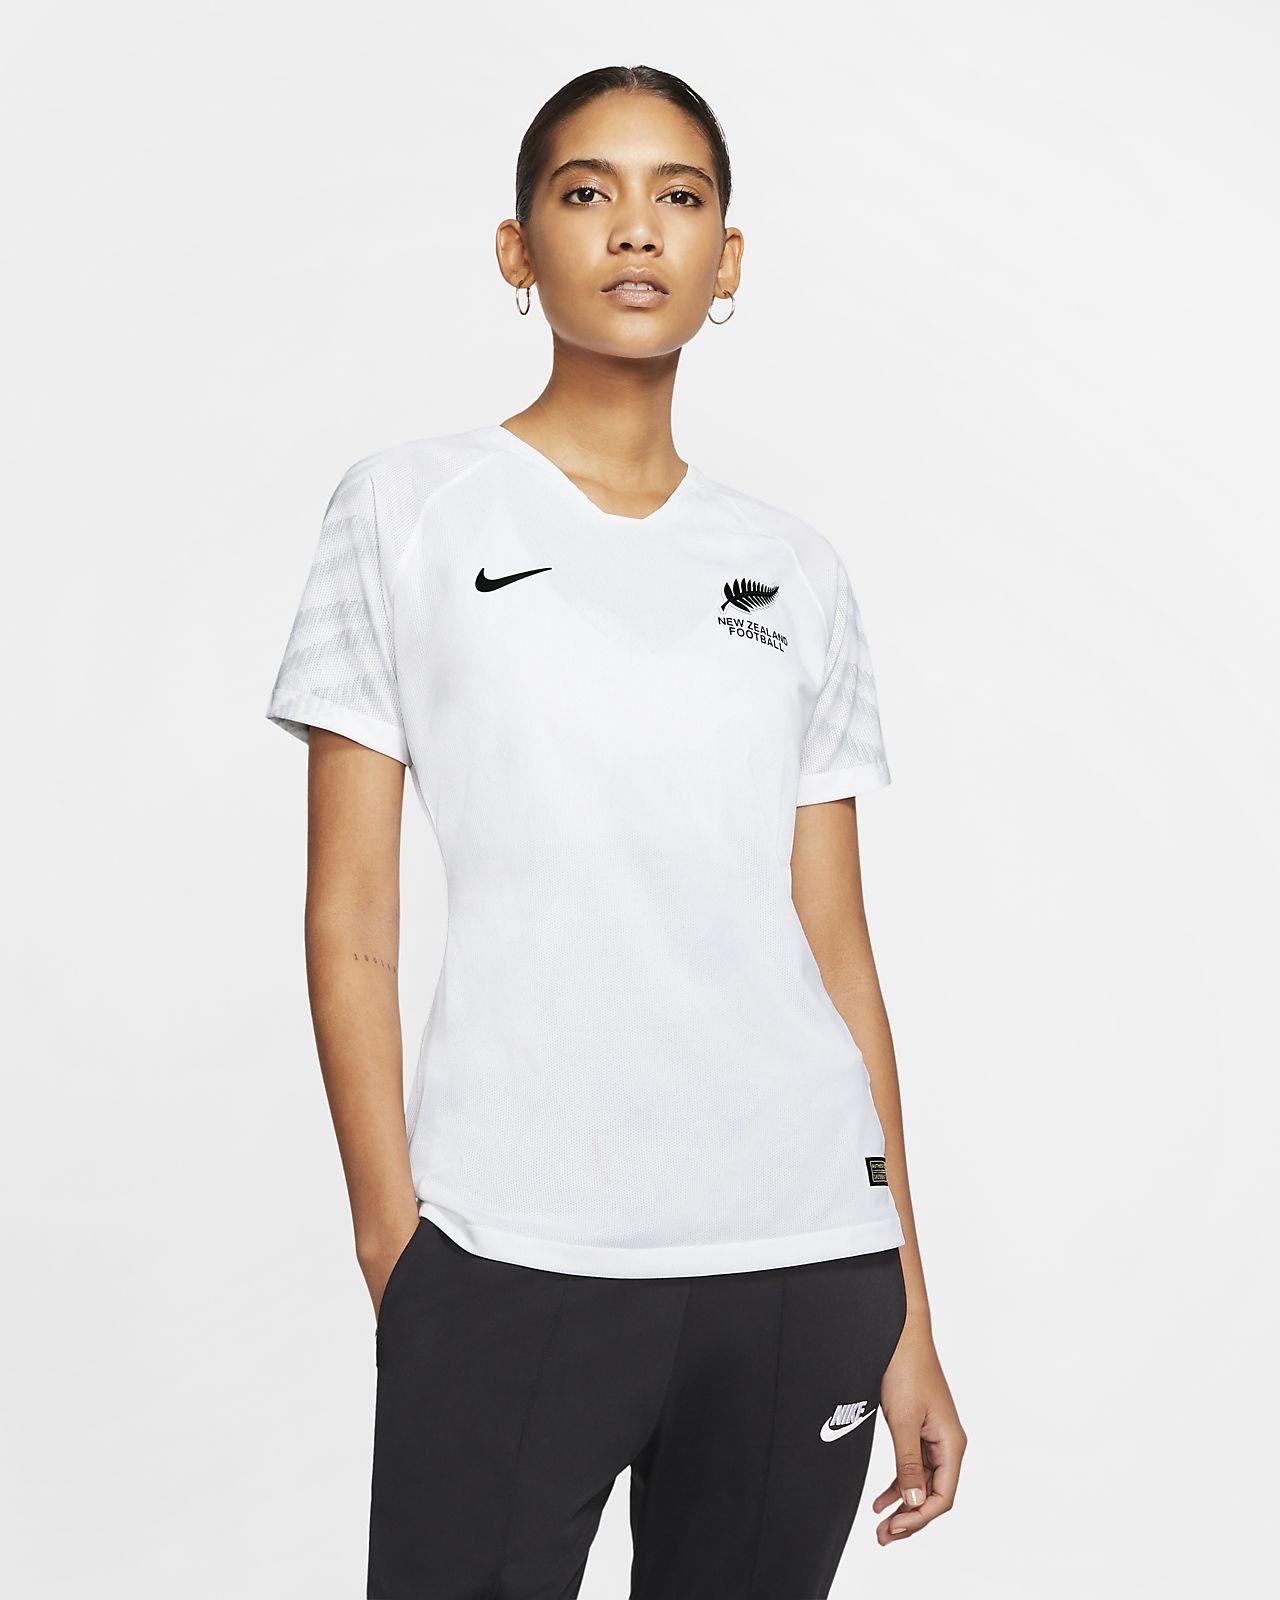 Camiseta de fútbol para mujer New Zealand 2019 de local